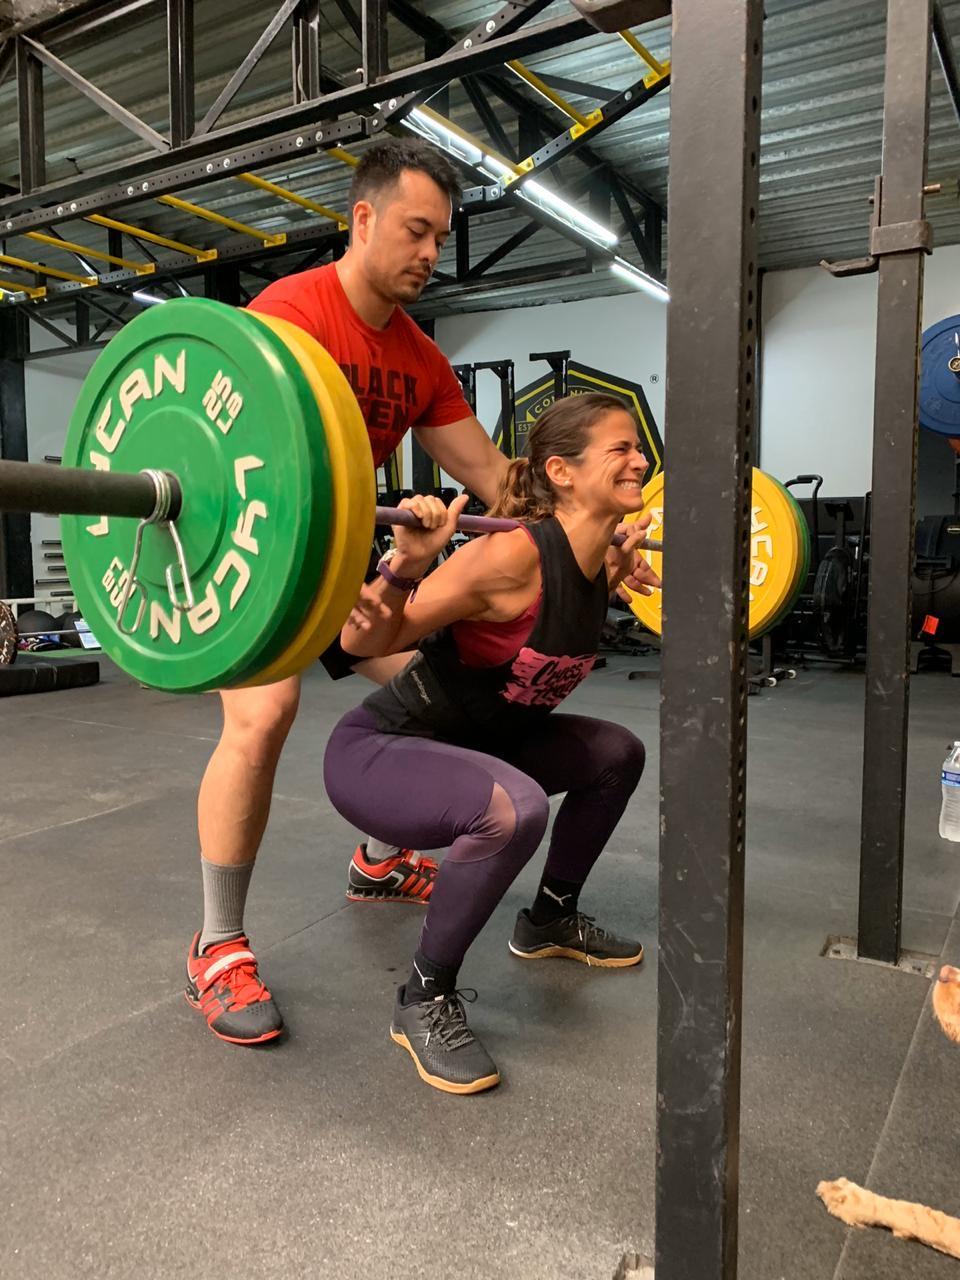 Mujer haciendo una pesa